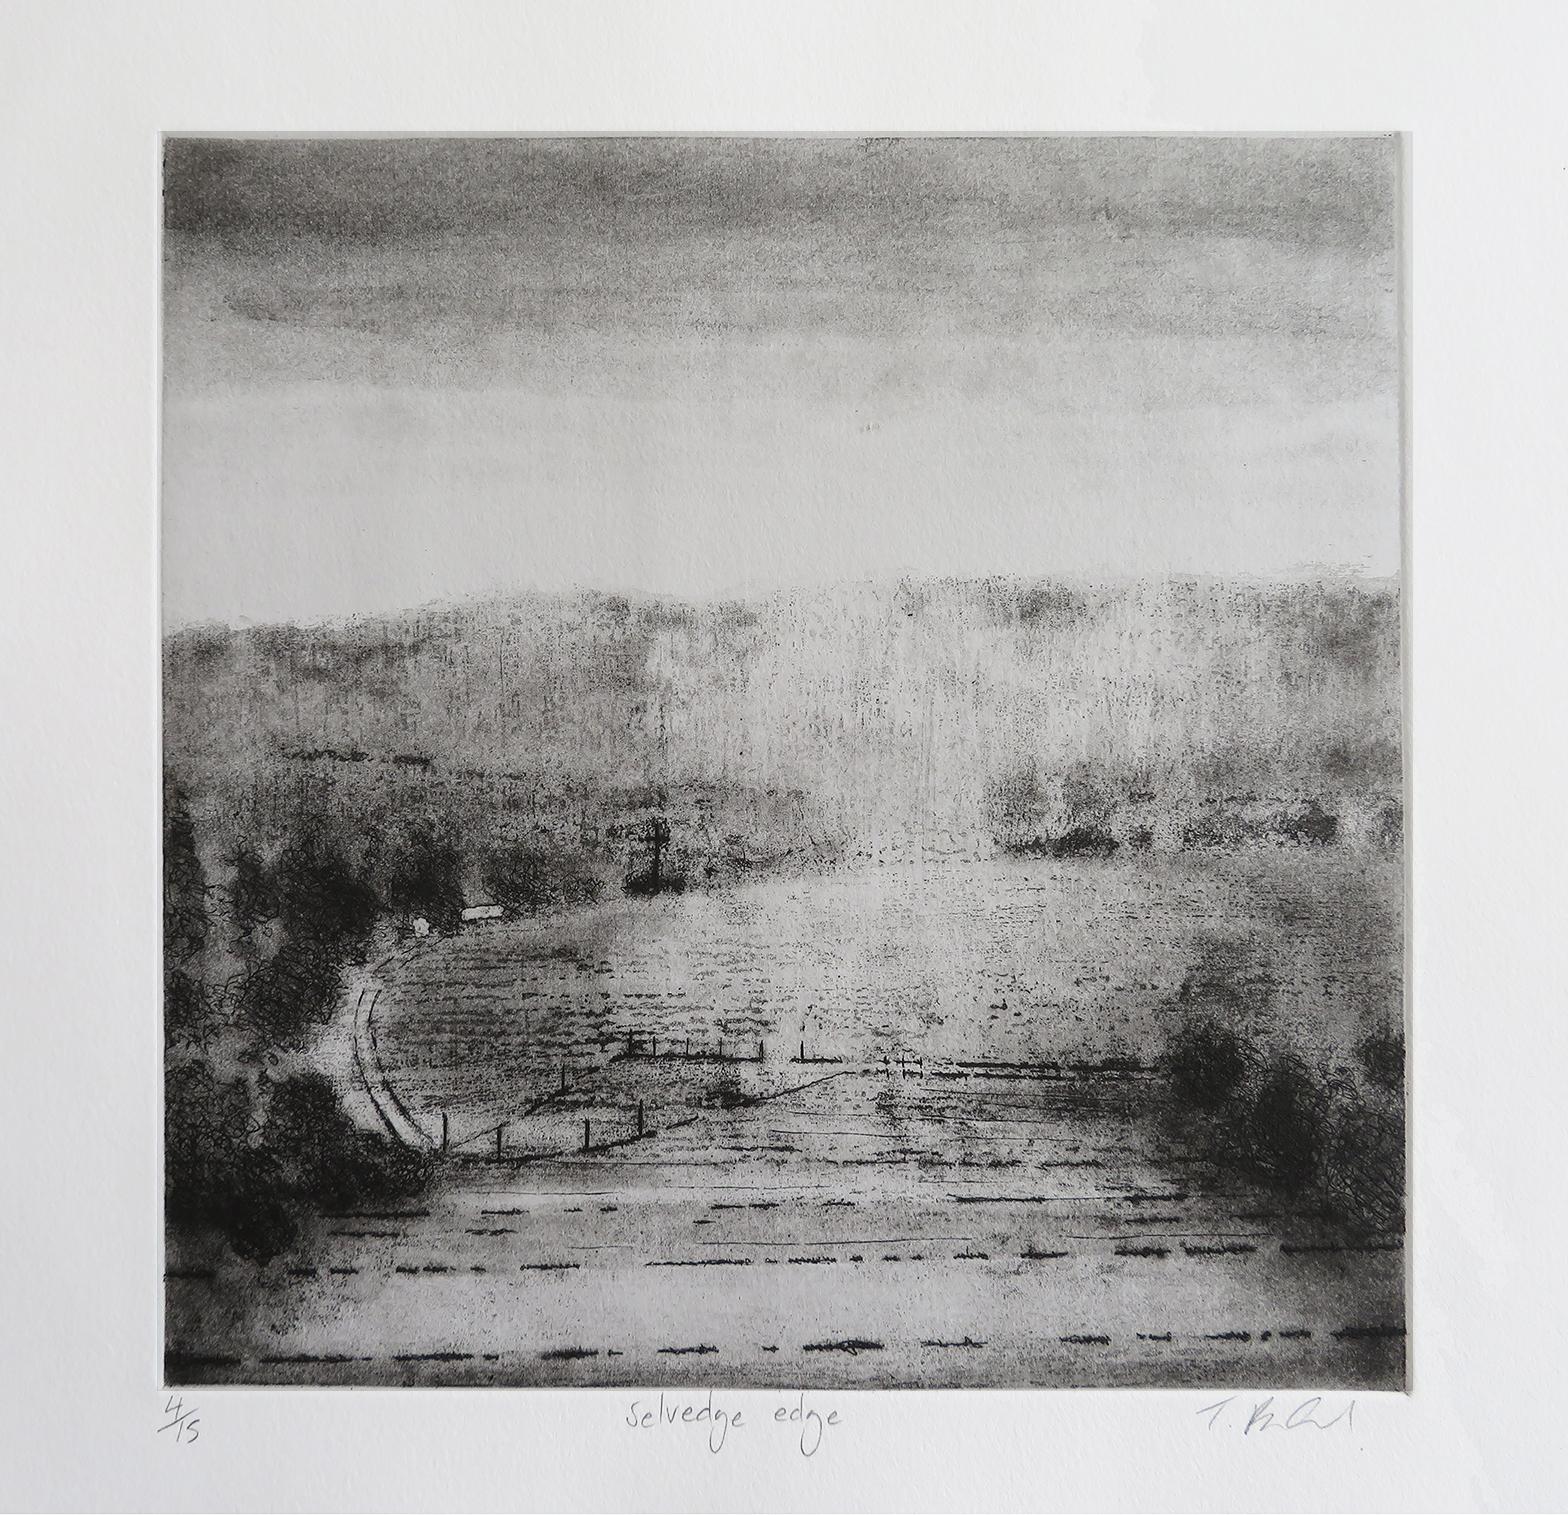 032 - TR - Selvedge edge (24x24cm) etching.jpg